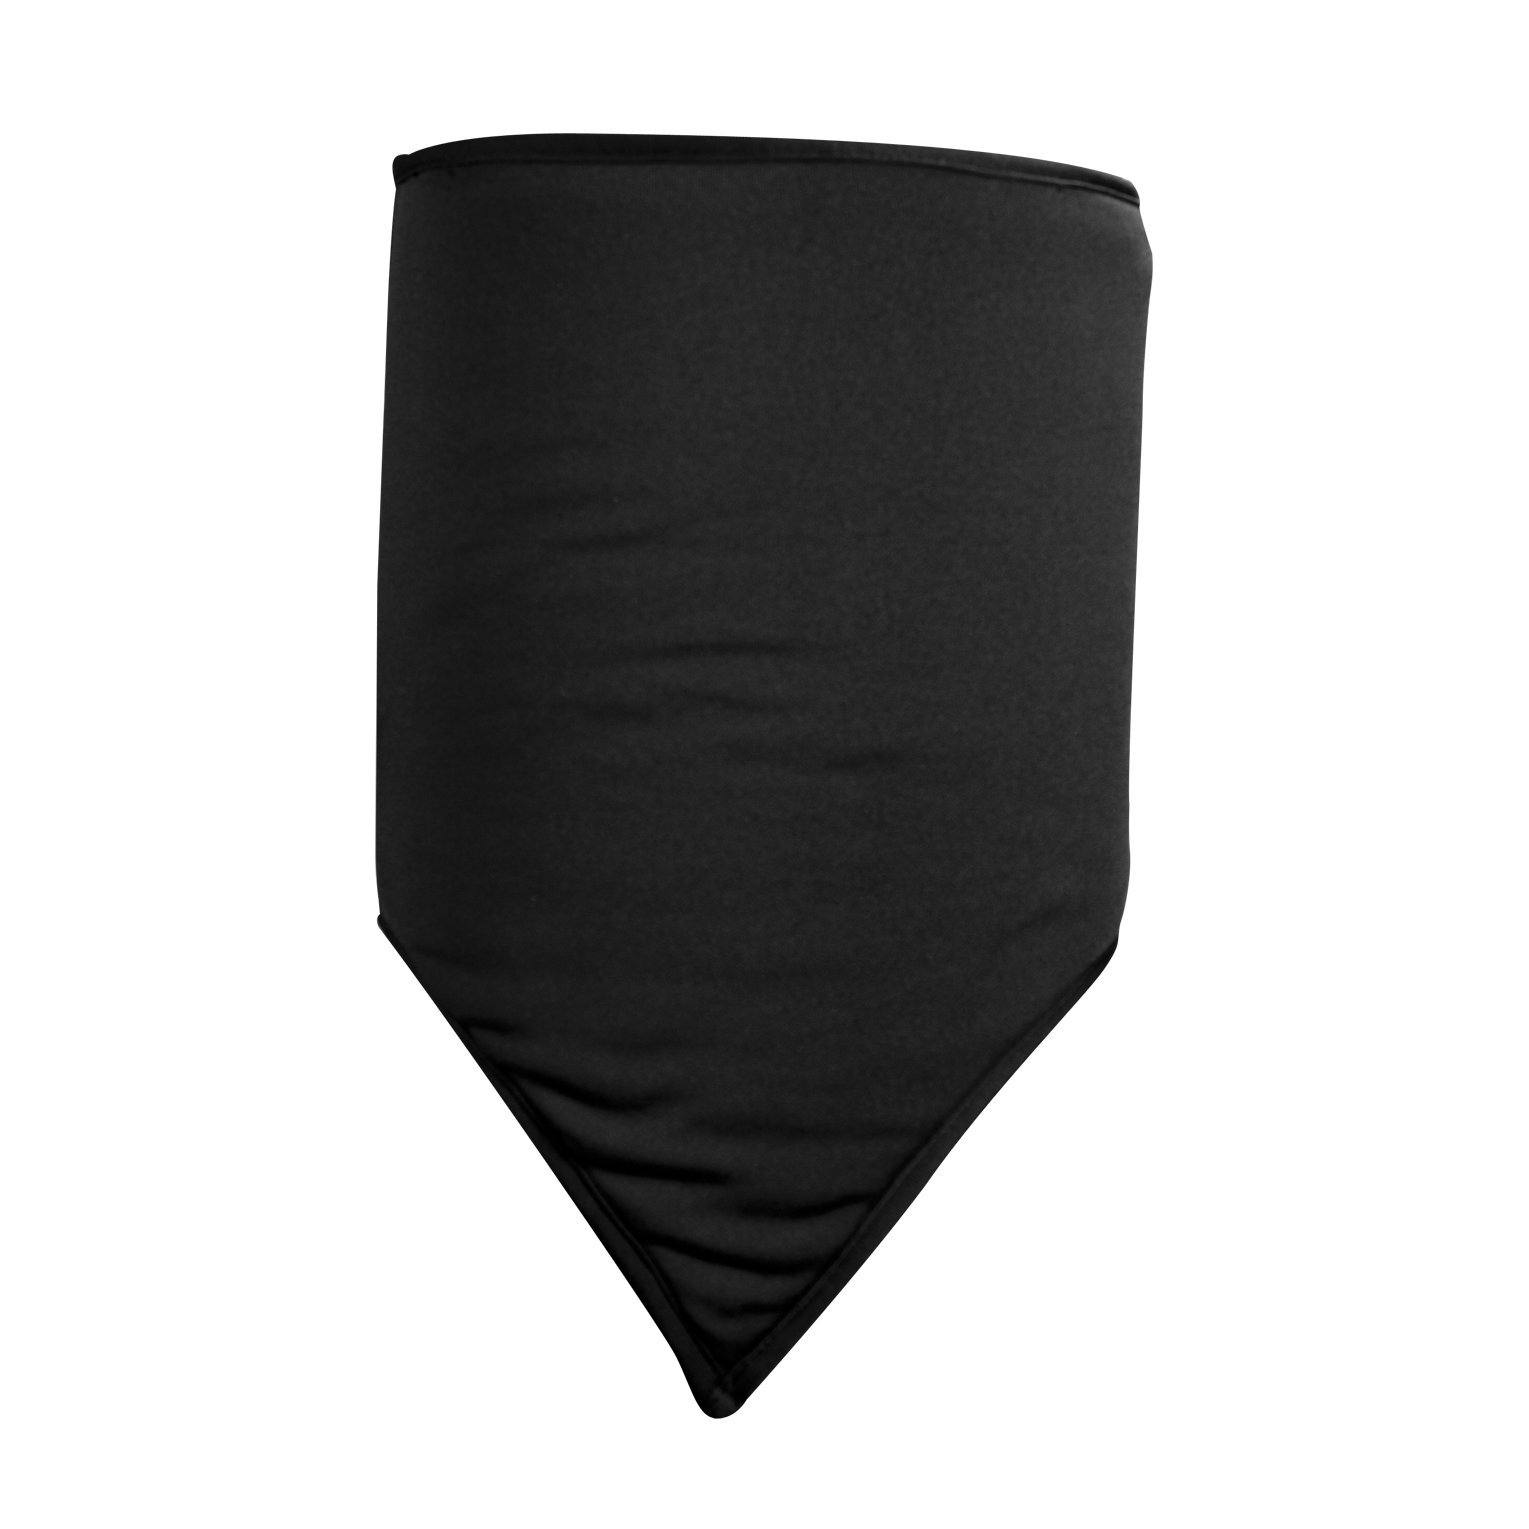 ZANheadgear WNGF114 Unisex-Adult Combo Gaiter Cozy Fleece (One Size Fits Most, Black)